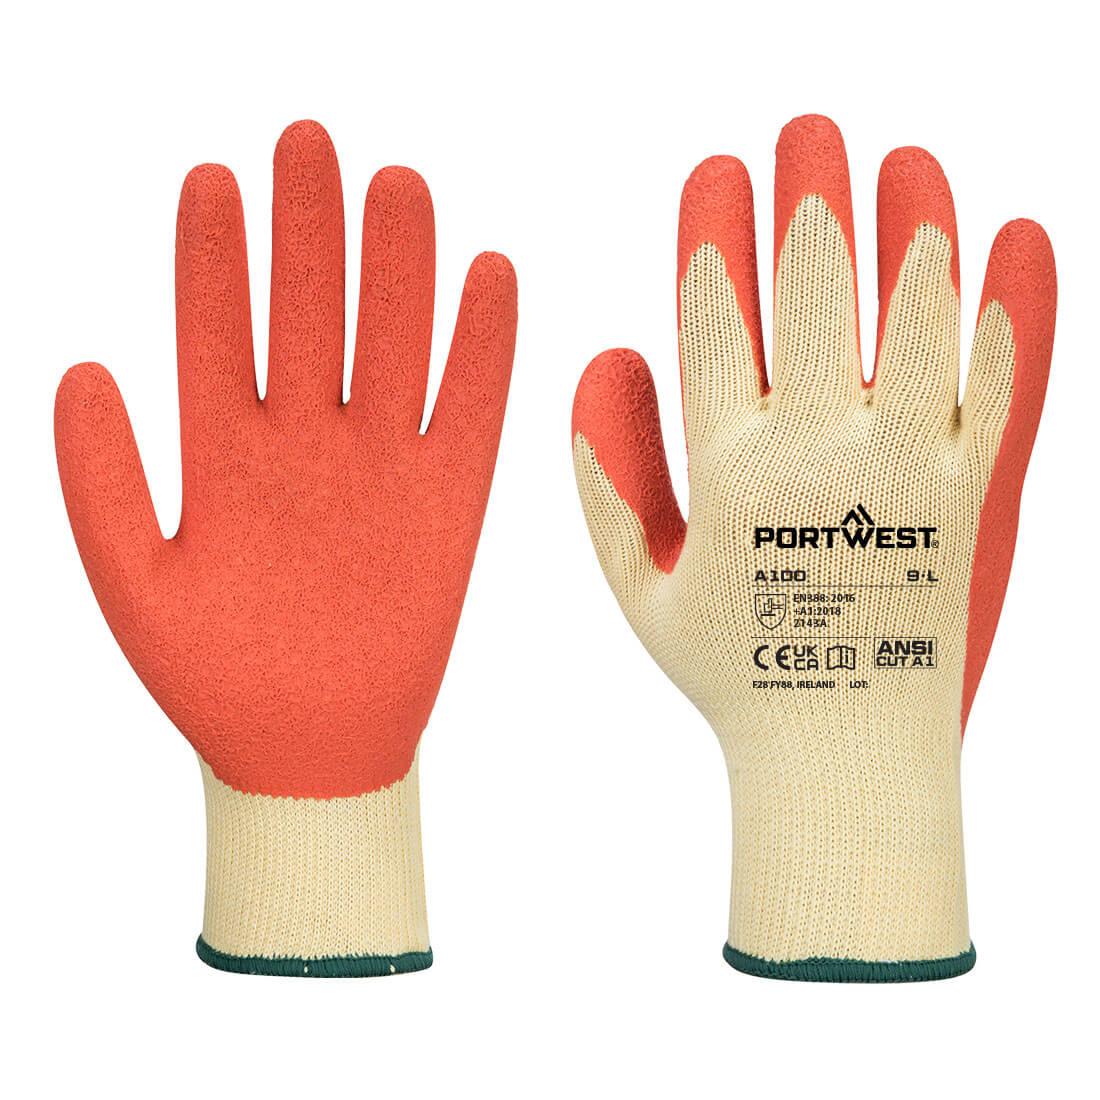 Grip Glove, Orange     Size Large R/Fit